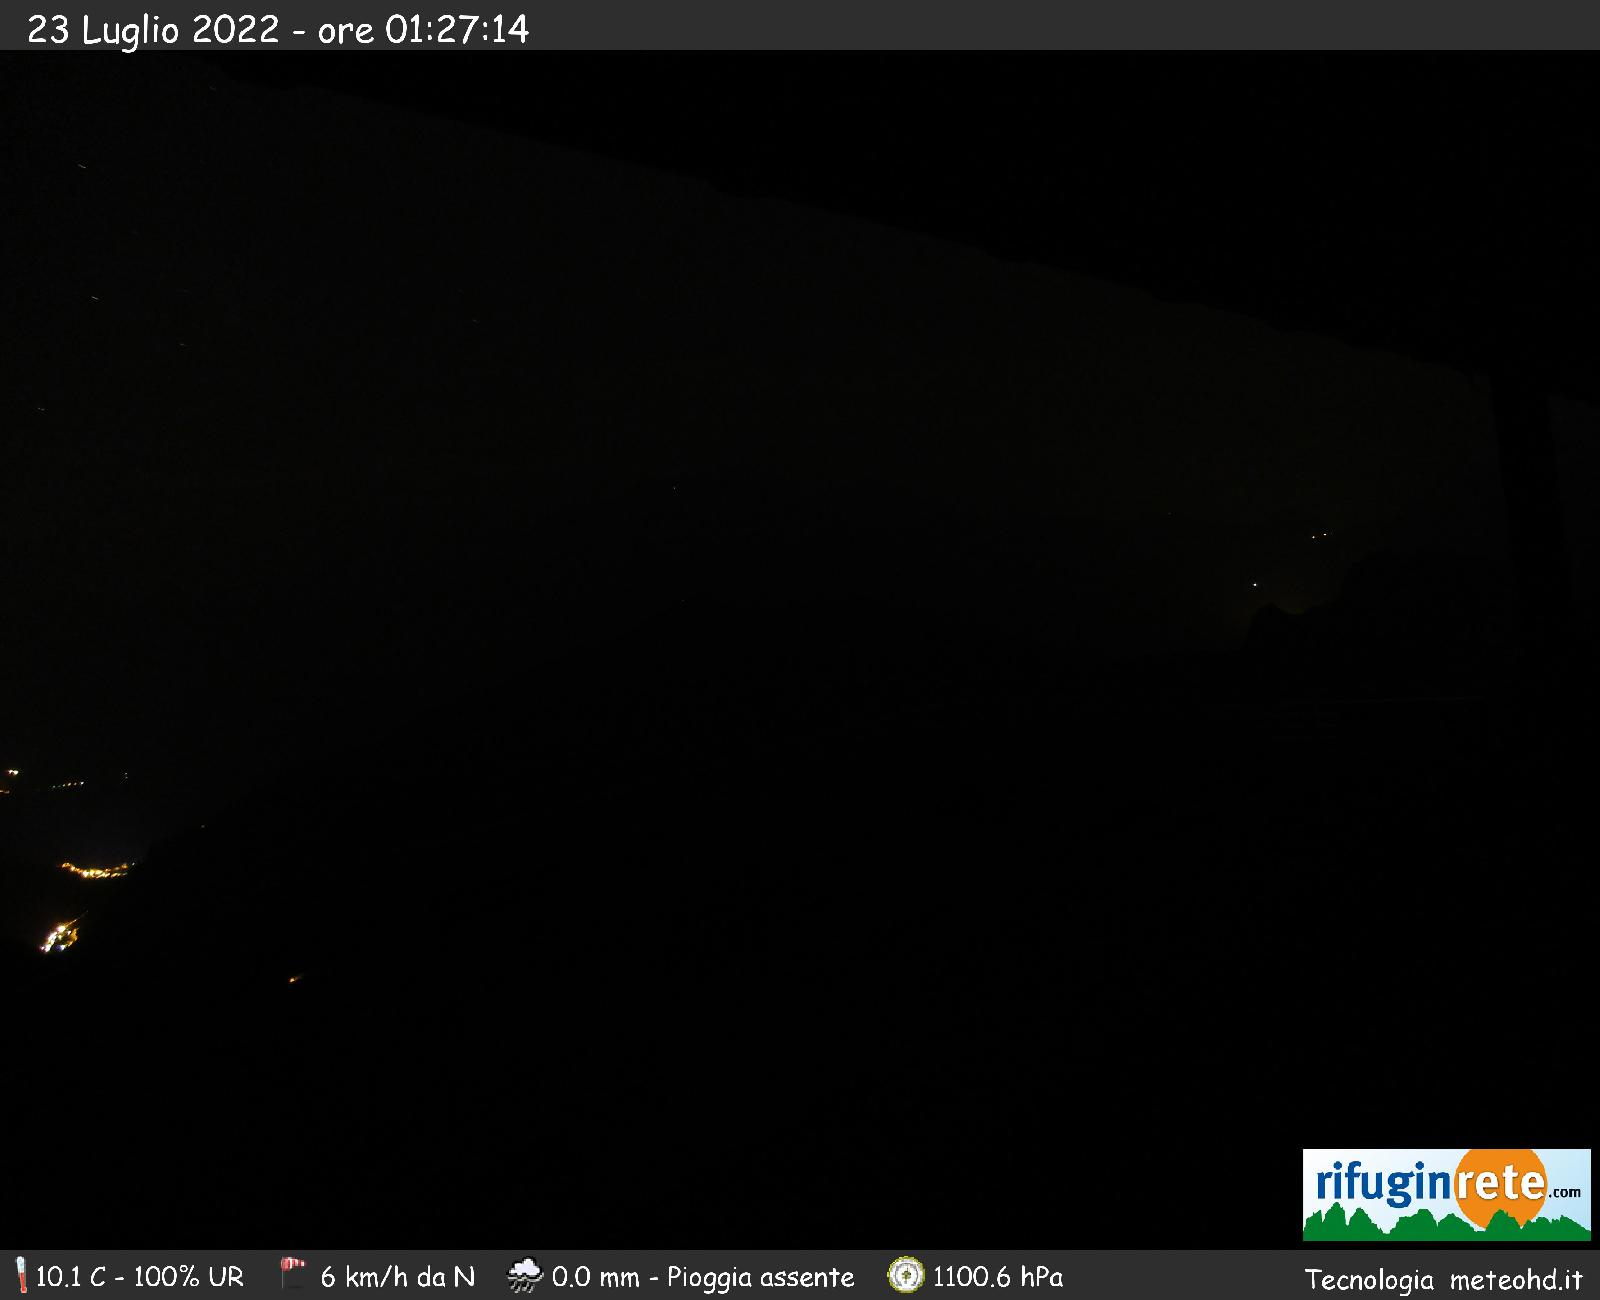 Webcam from Lagazuoi Refuge toward Marmolada